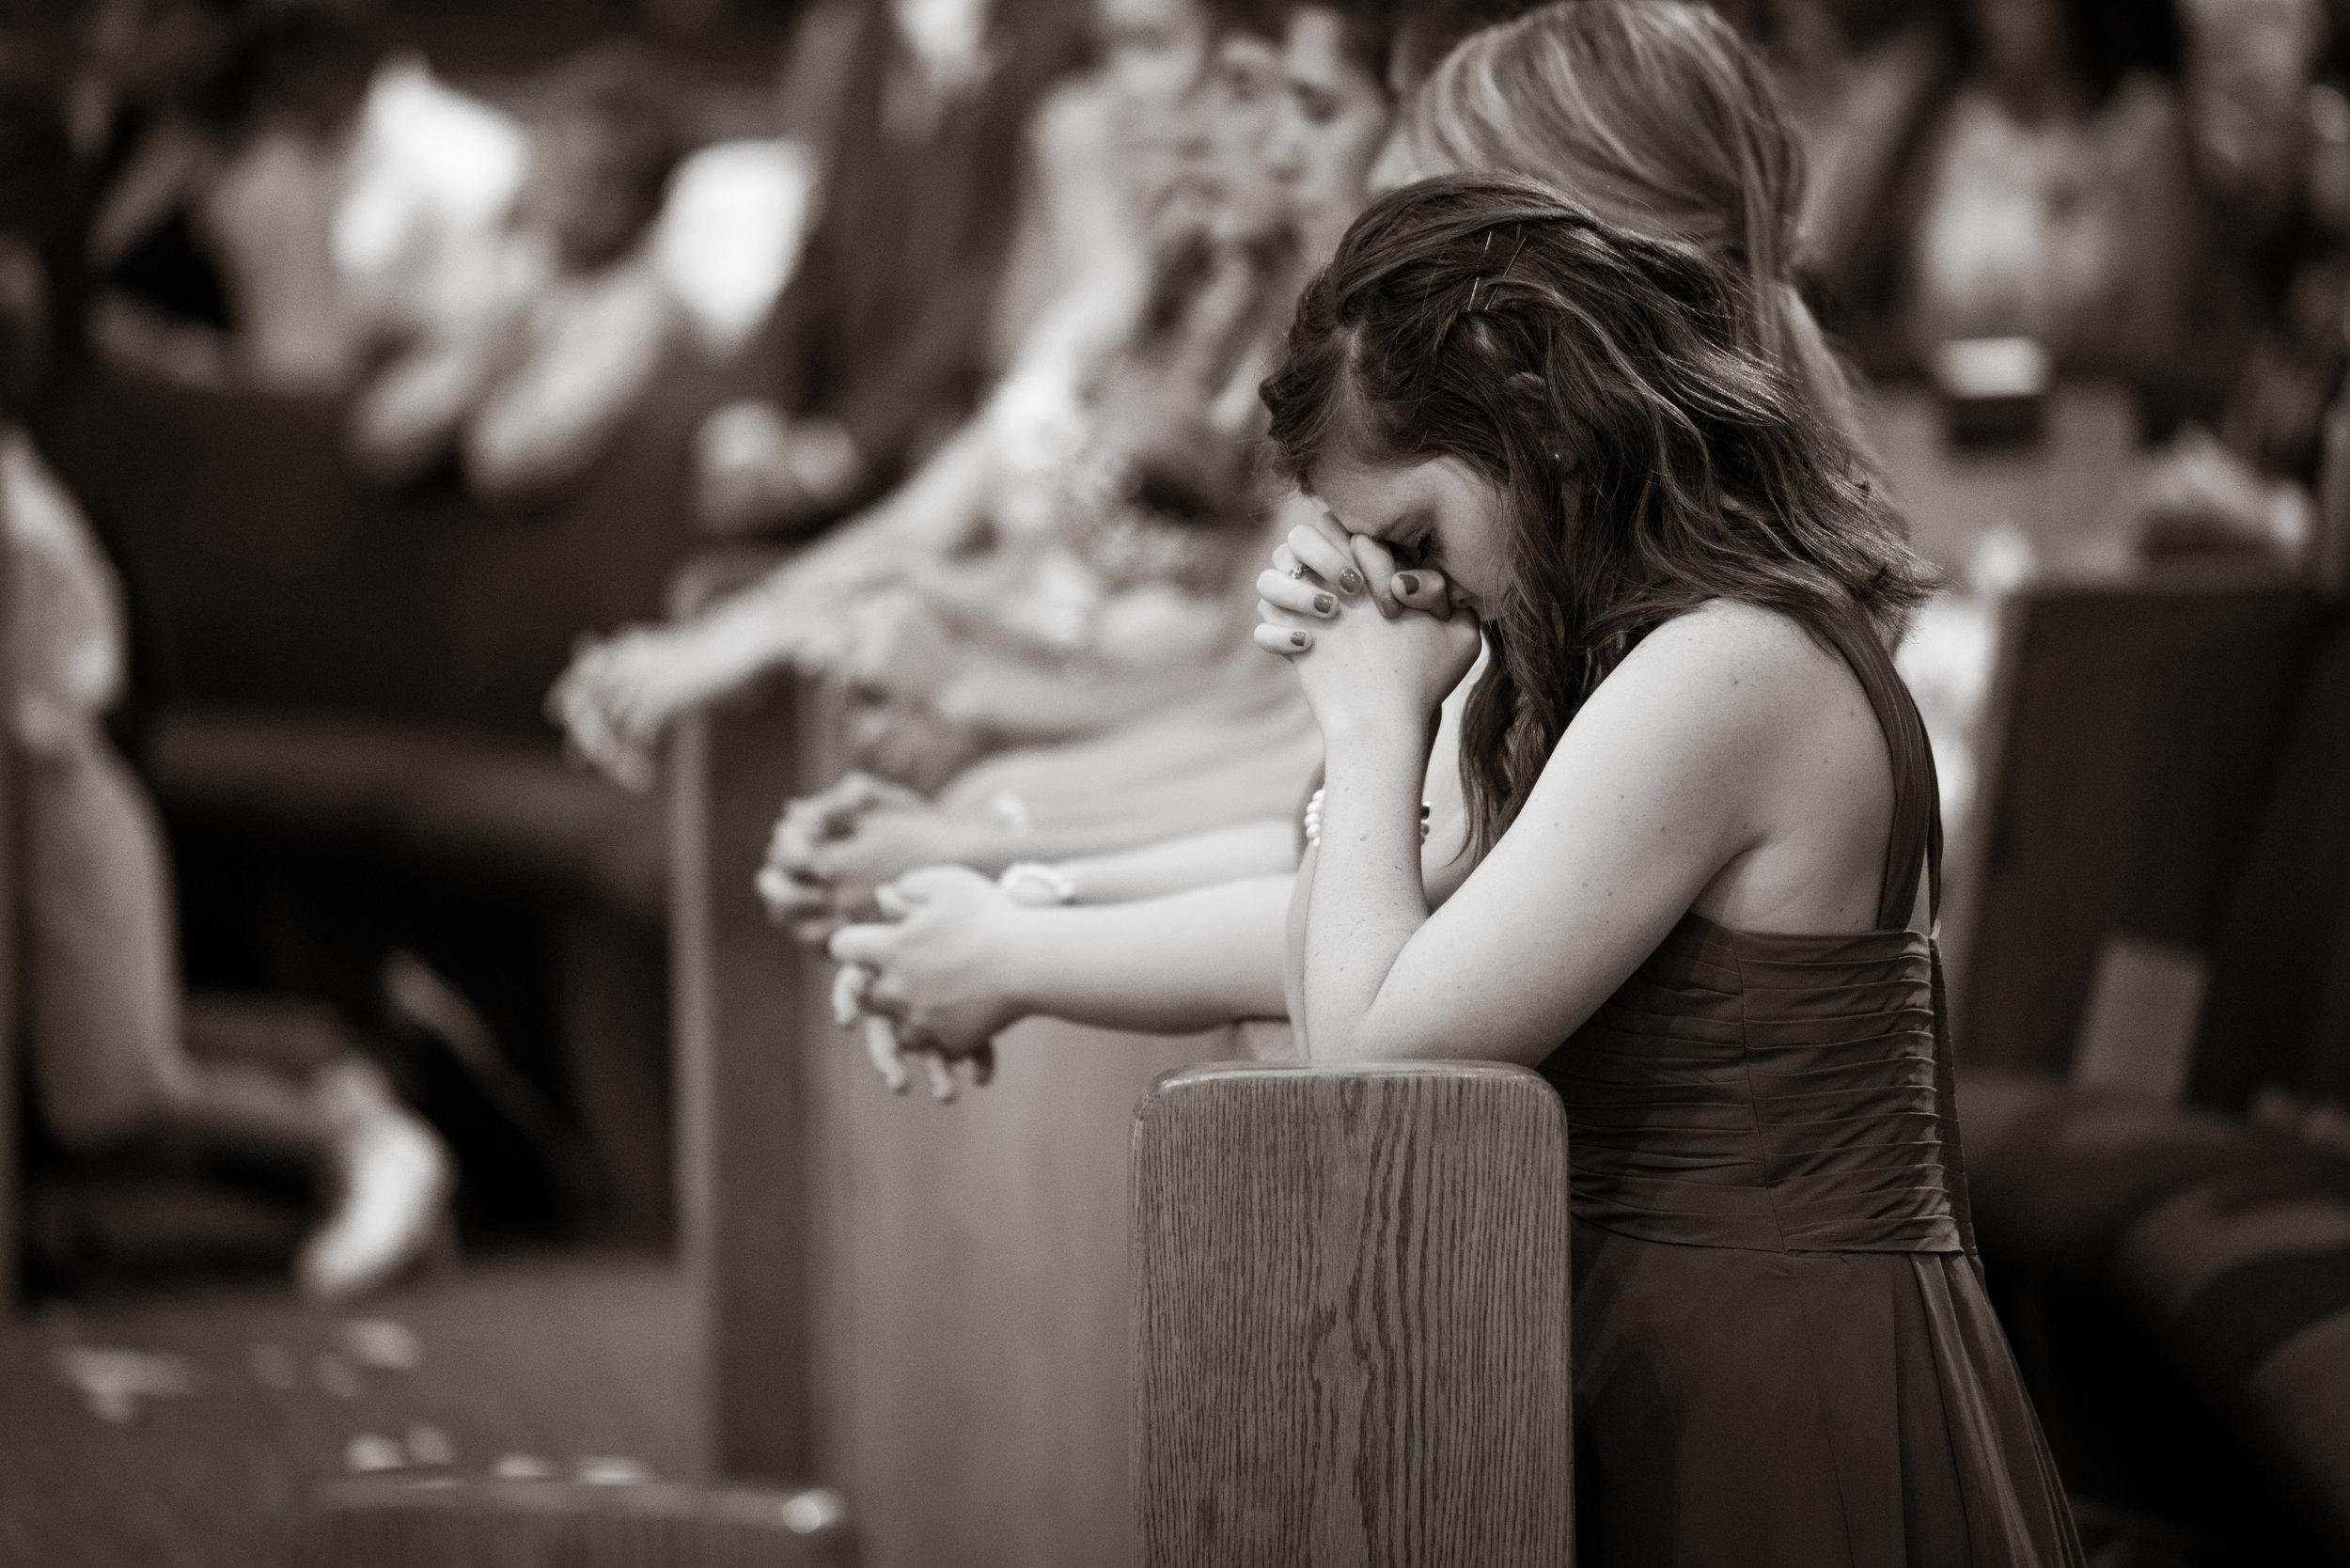 Bridesmaid praying during ceremony | St Mary Magdalene Catholic Church Simpsonville, SC